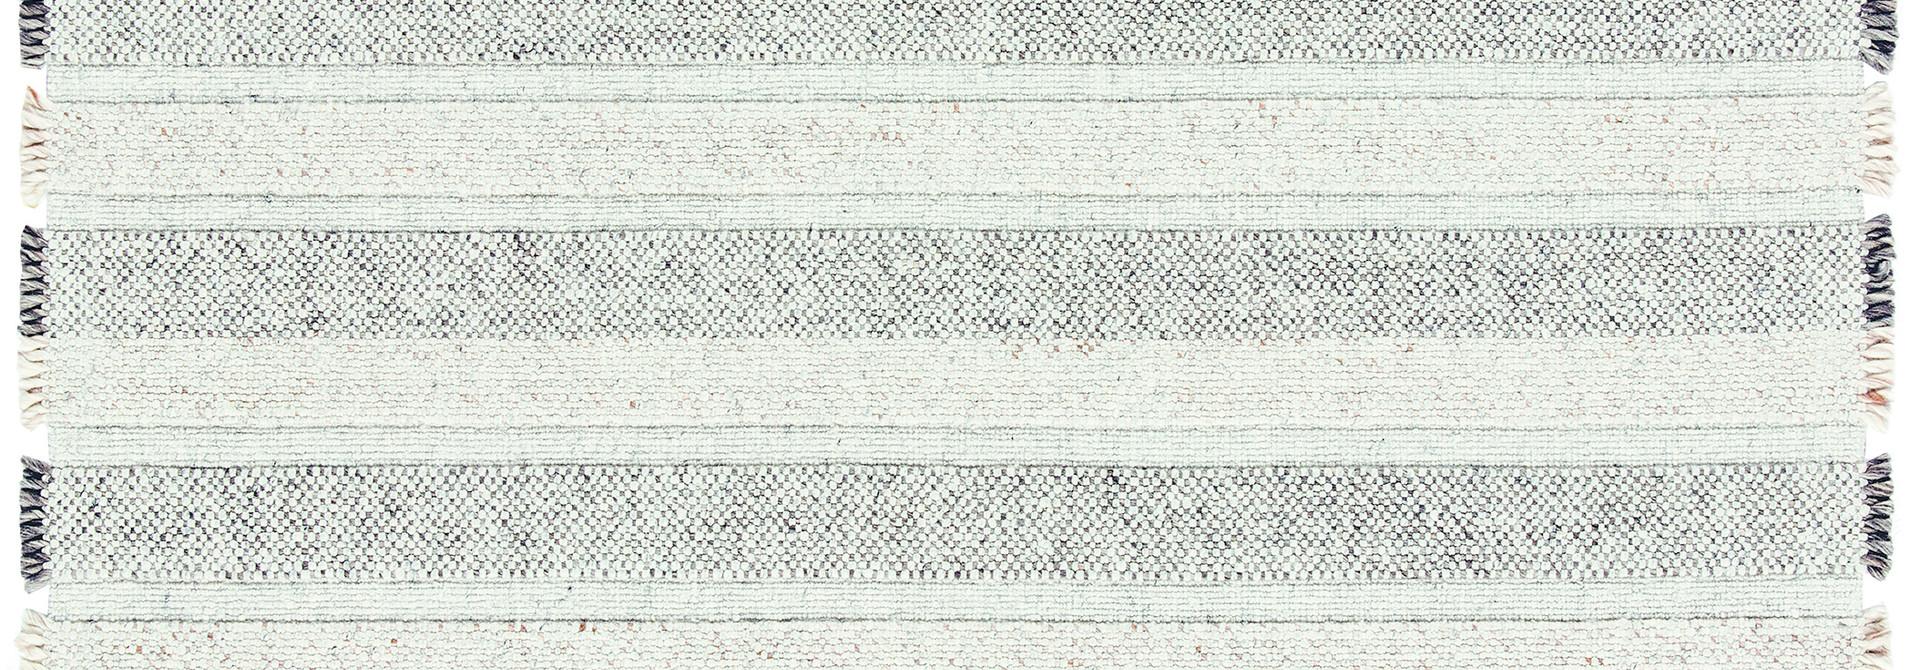 Vloerkleed Grade 900 170x240cm